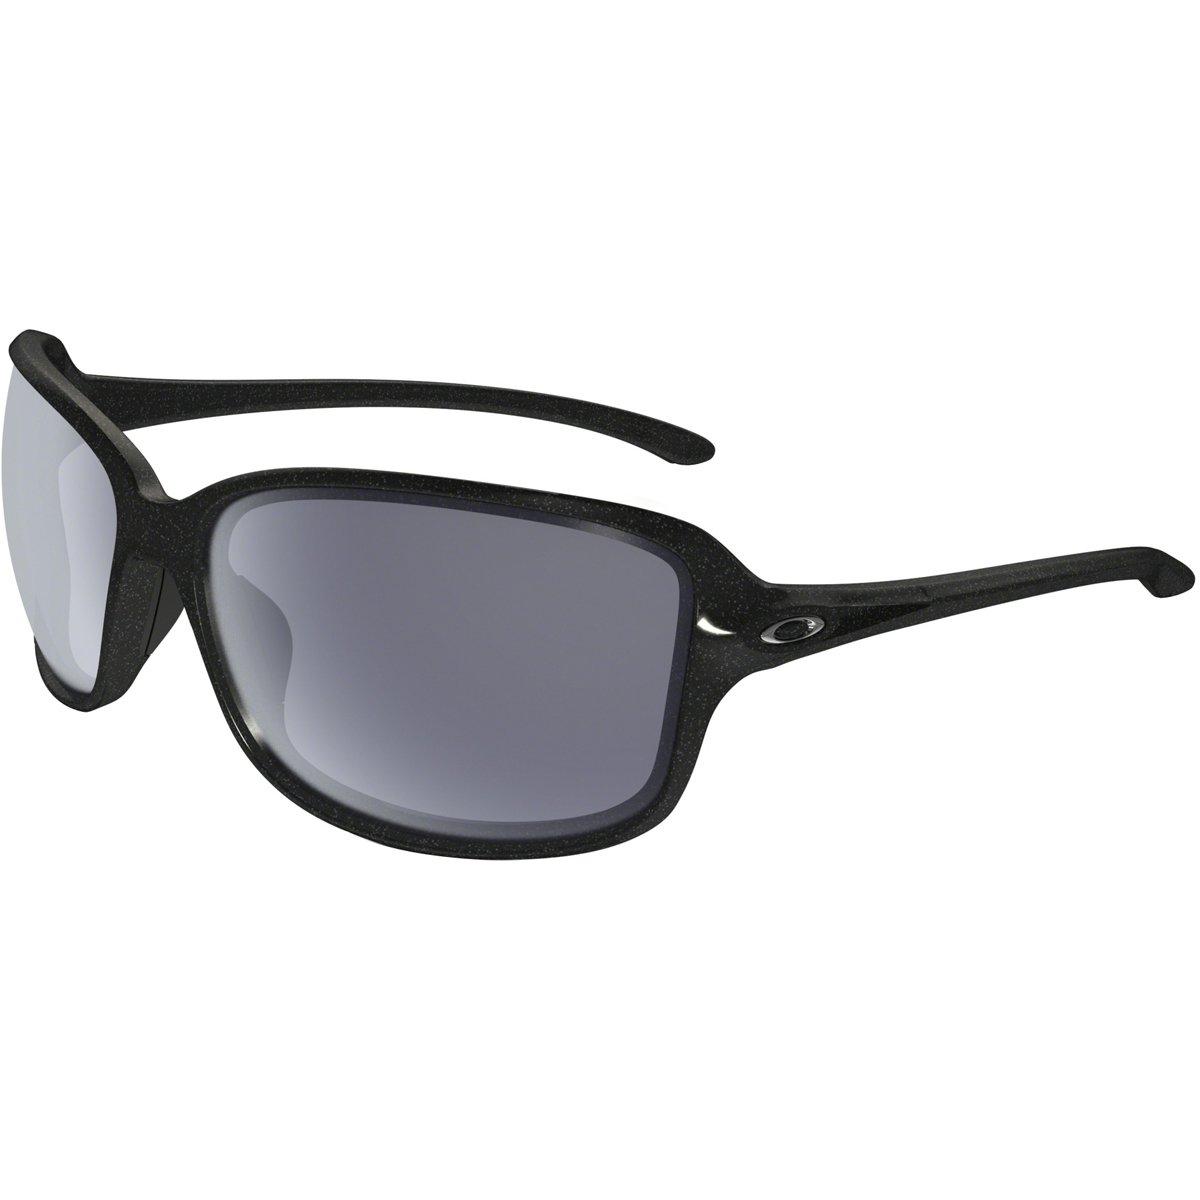 Oakley Women's Cohort Rectangular Sunglasses, Metallic Black, 61 mm